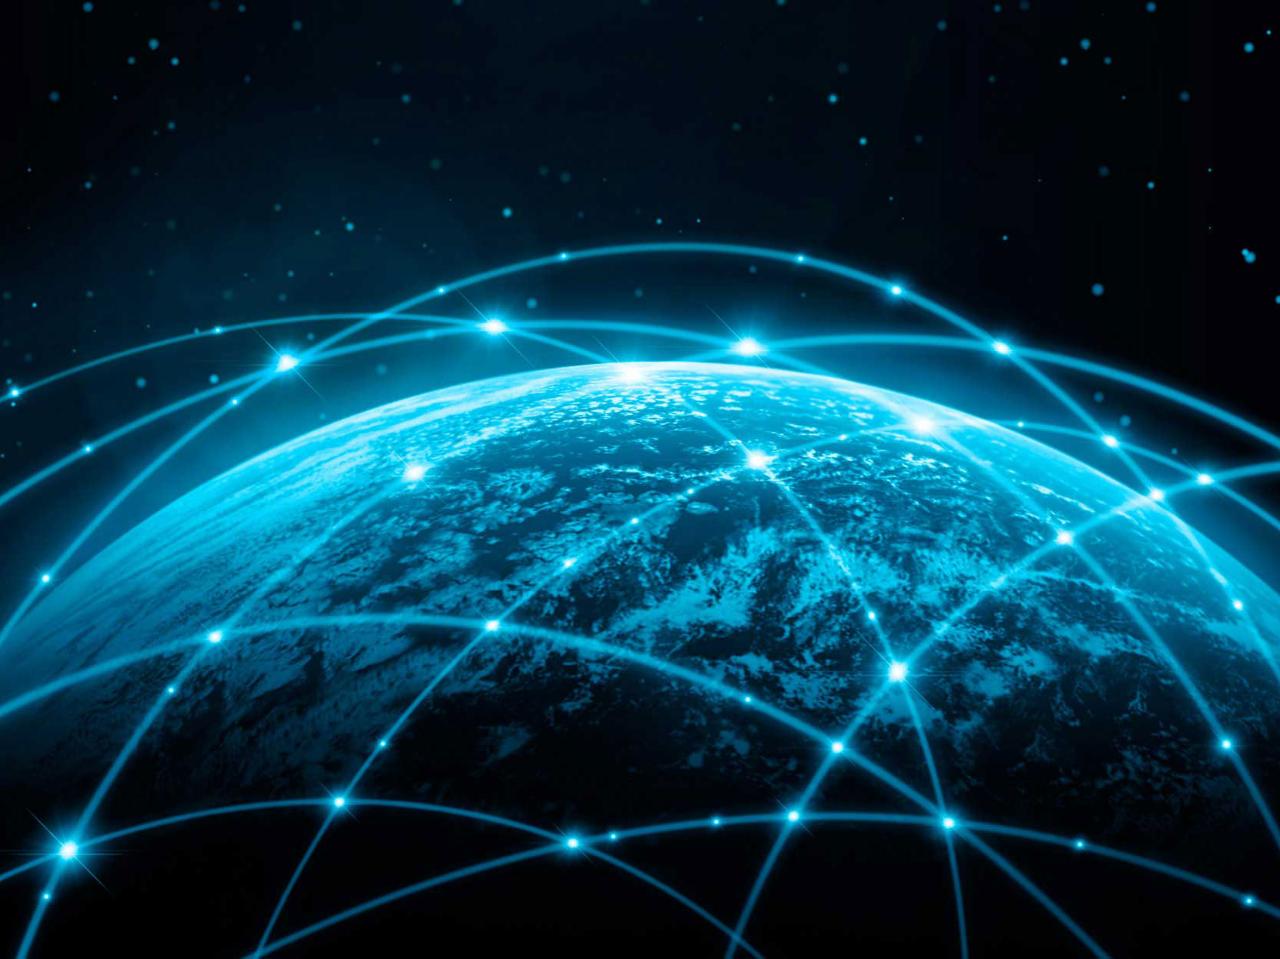 Projet Kuiper : Amazon envisage sa propre constellation de satellites